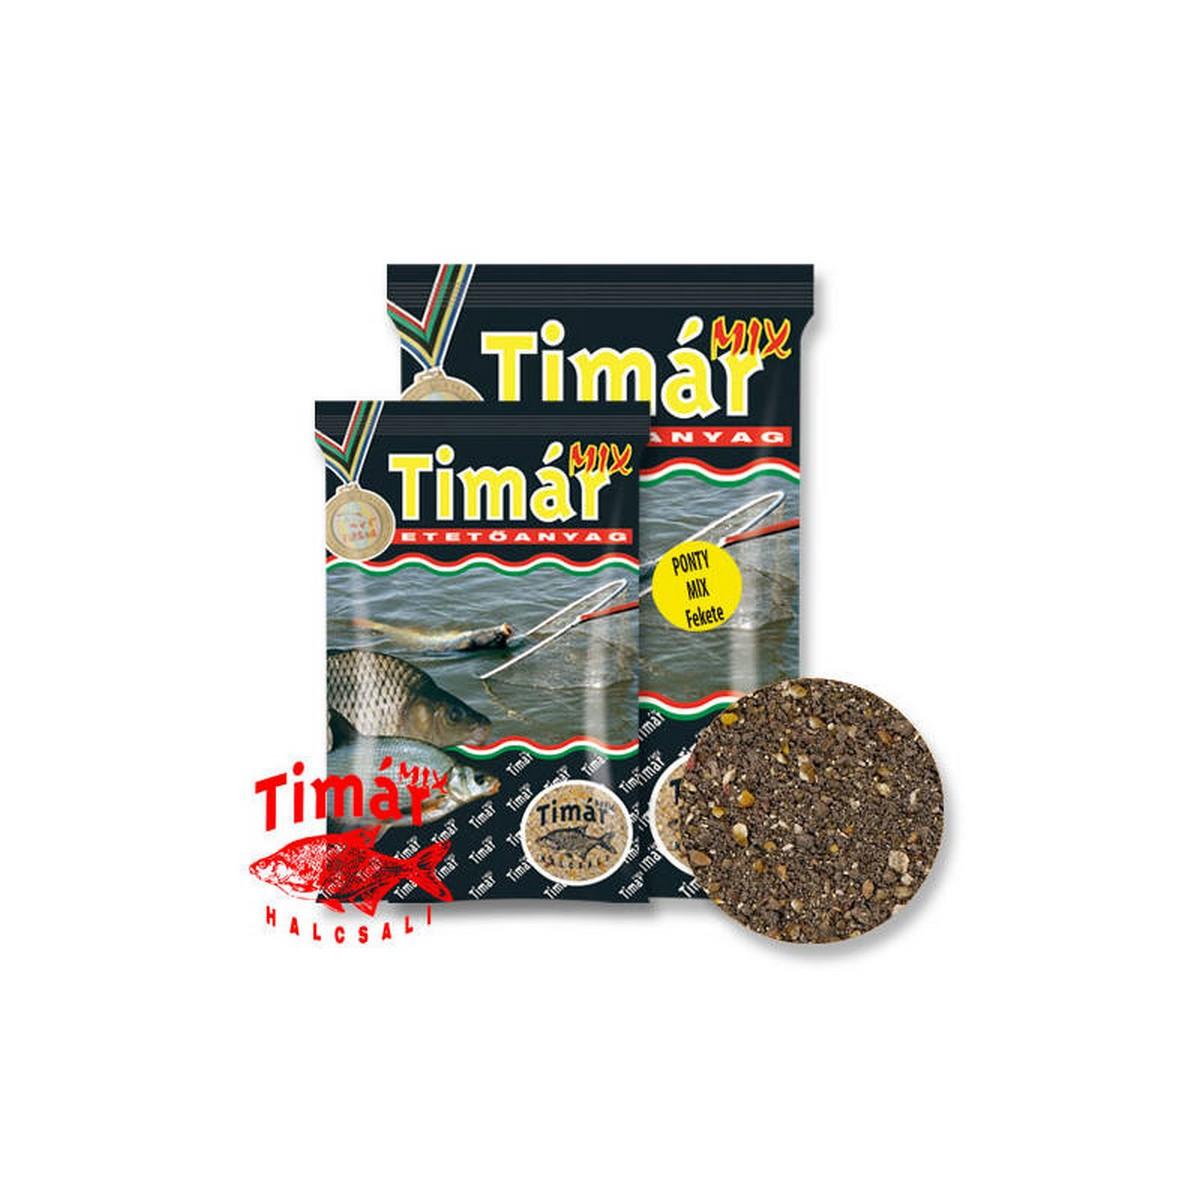 TIMÁR MIX PONTY MIX FEKETE 3KG